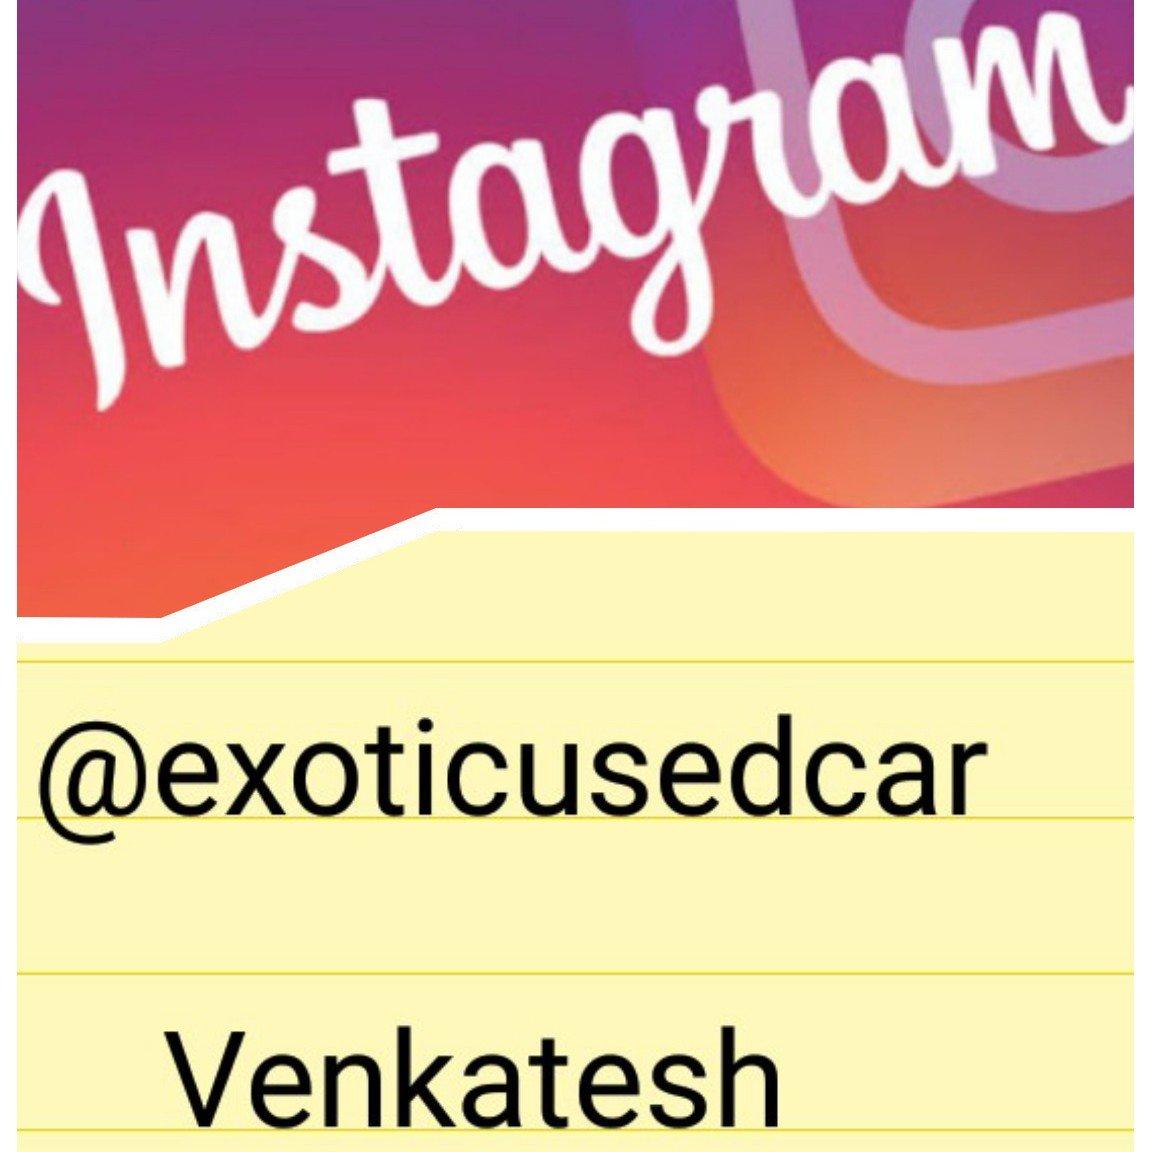 #instagramm #instagram_faces #instagrams #instalike #travel #followme #photography #instagramhub #igers #likeforlike #follow #photooftheday #instamood #like4like #instagramers #instagram #bestoftheday #photo #instagram_kids #instagram_turkey #fashion #love #instapic